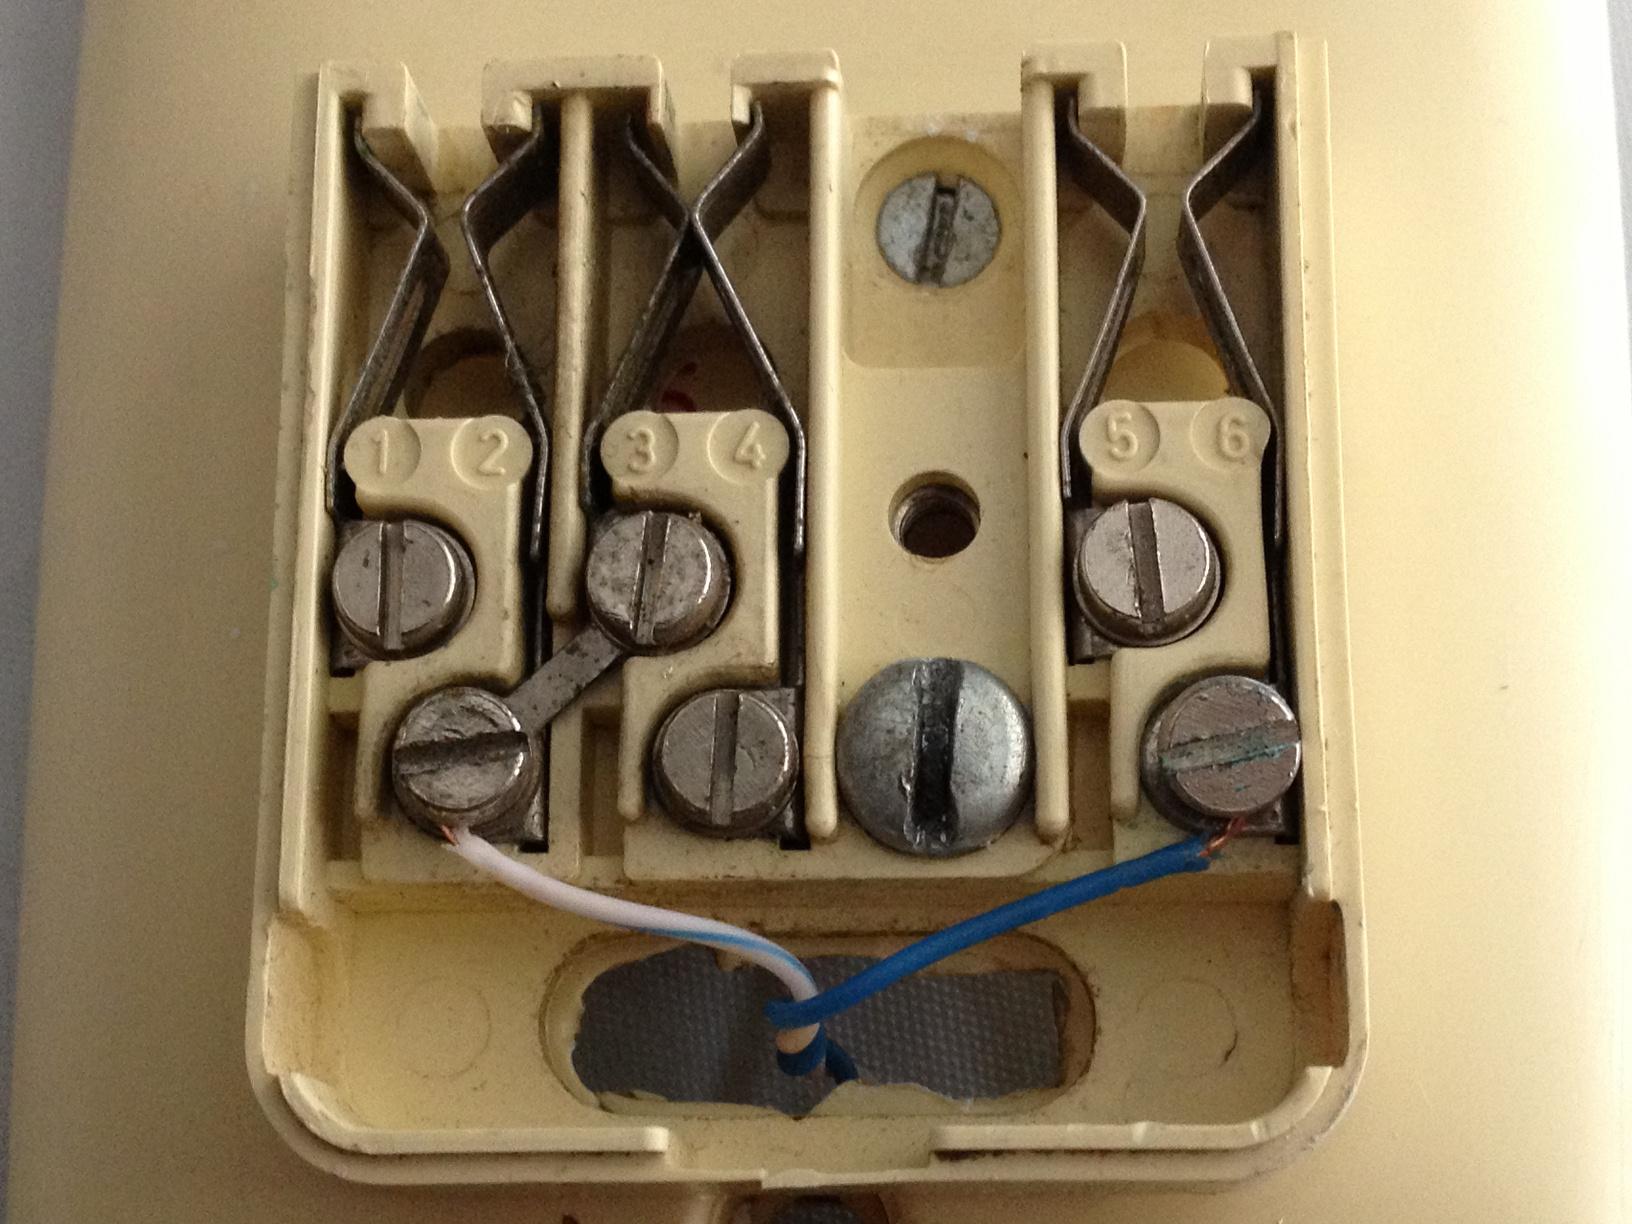 medium resolution of socket outlet google on australian telephone wall socket wiring wiring diagram rows